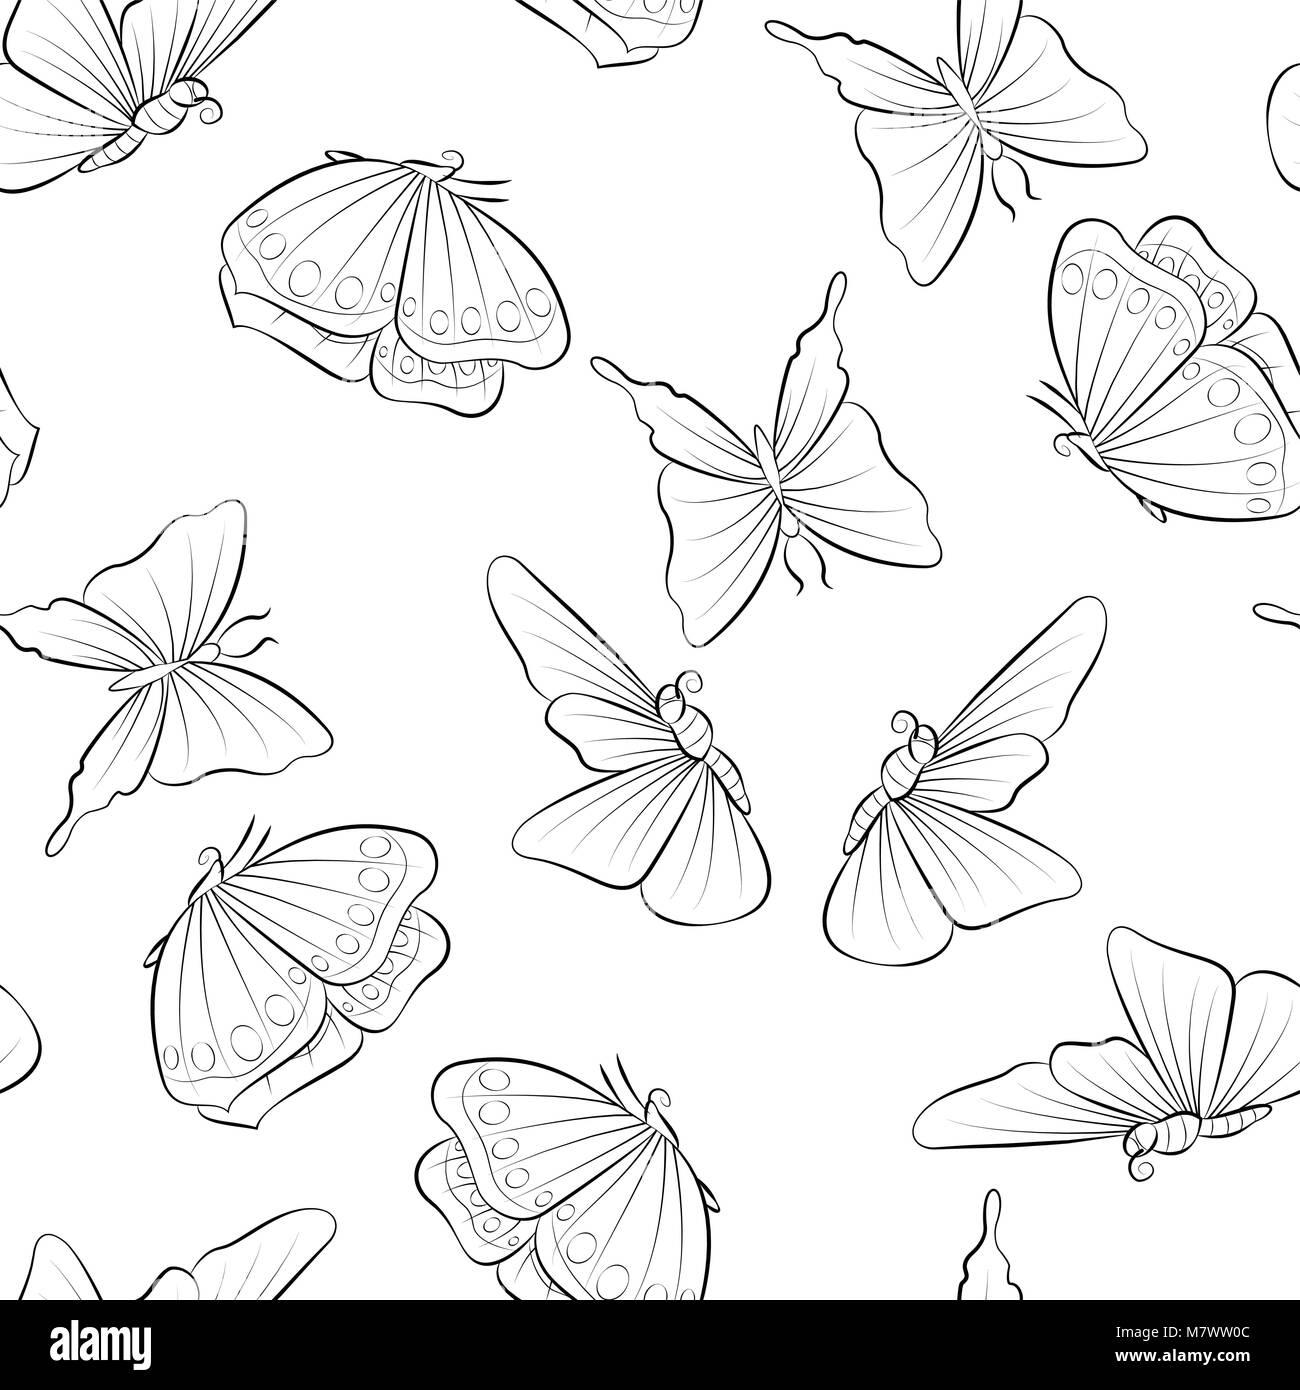 Diferentes hermosa mariposa volando alrededor de libro para colorear ...